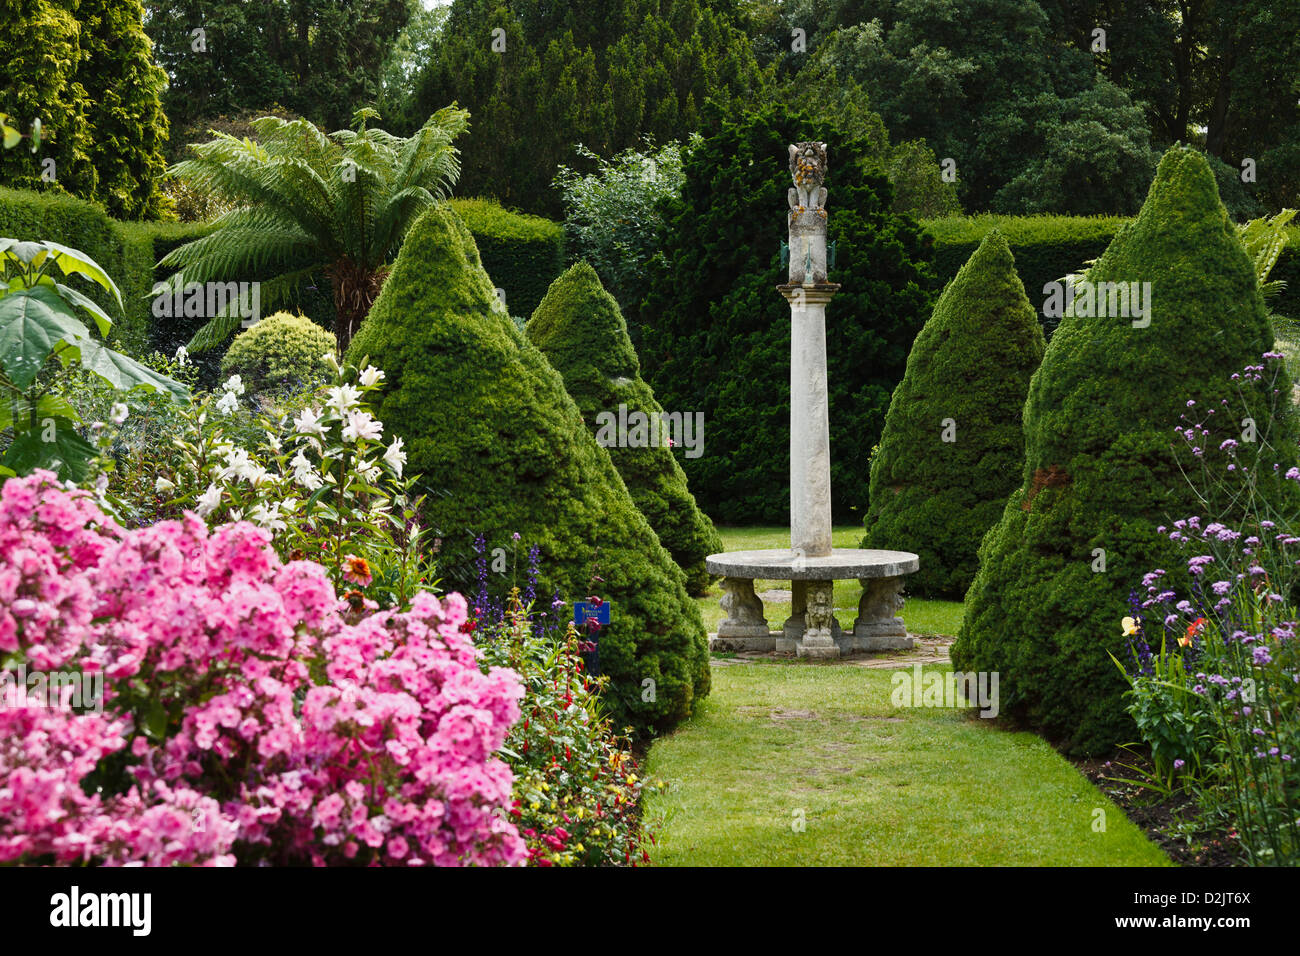 The Sundial Garden, Exbury Gardens, New Forest, Hampshire, England